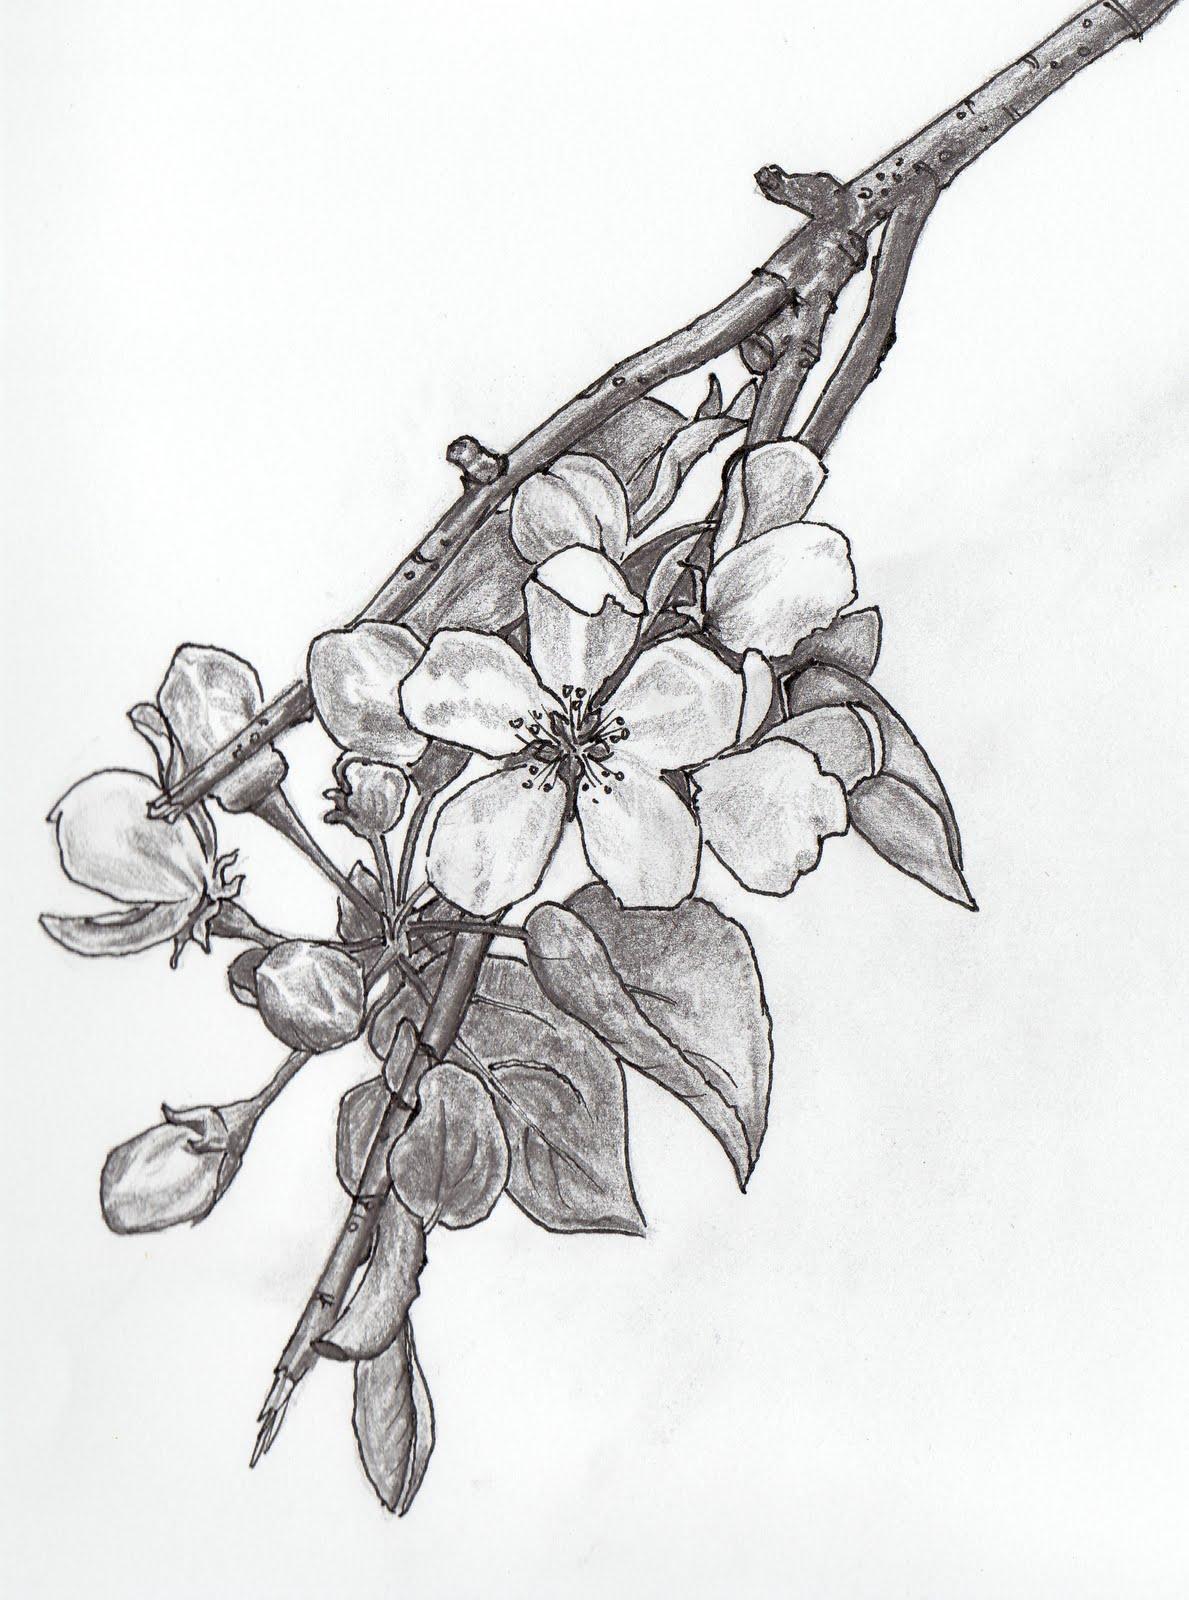 Drawn sakura blossom apple blossom Apple Blossom Elise heroes Apple